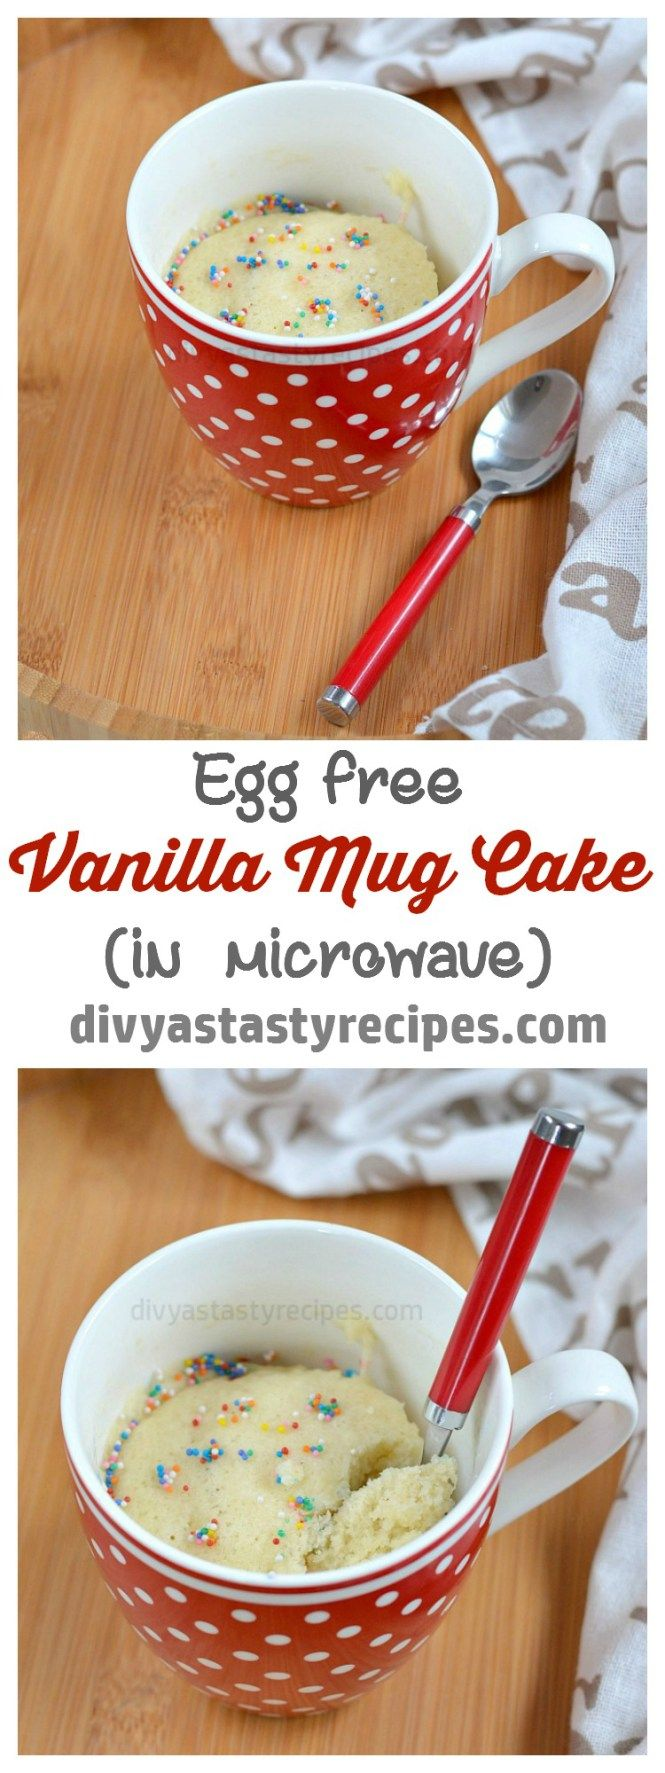 Vanilla Mug Cake, Eggless Vanilla Mug Cake in Microwave ...